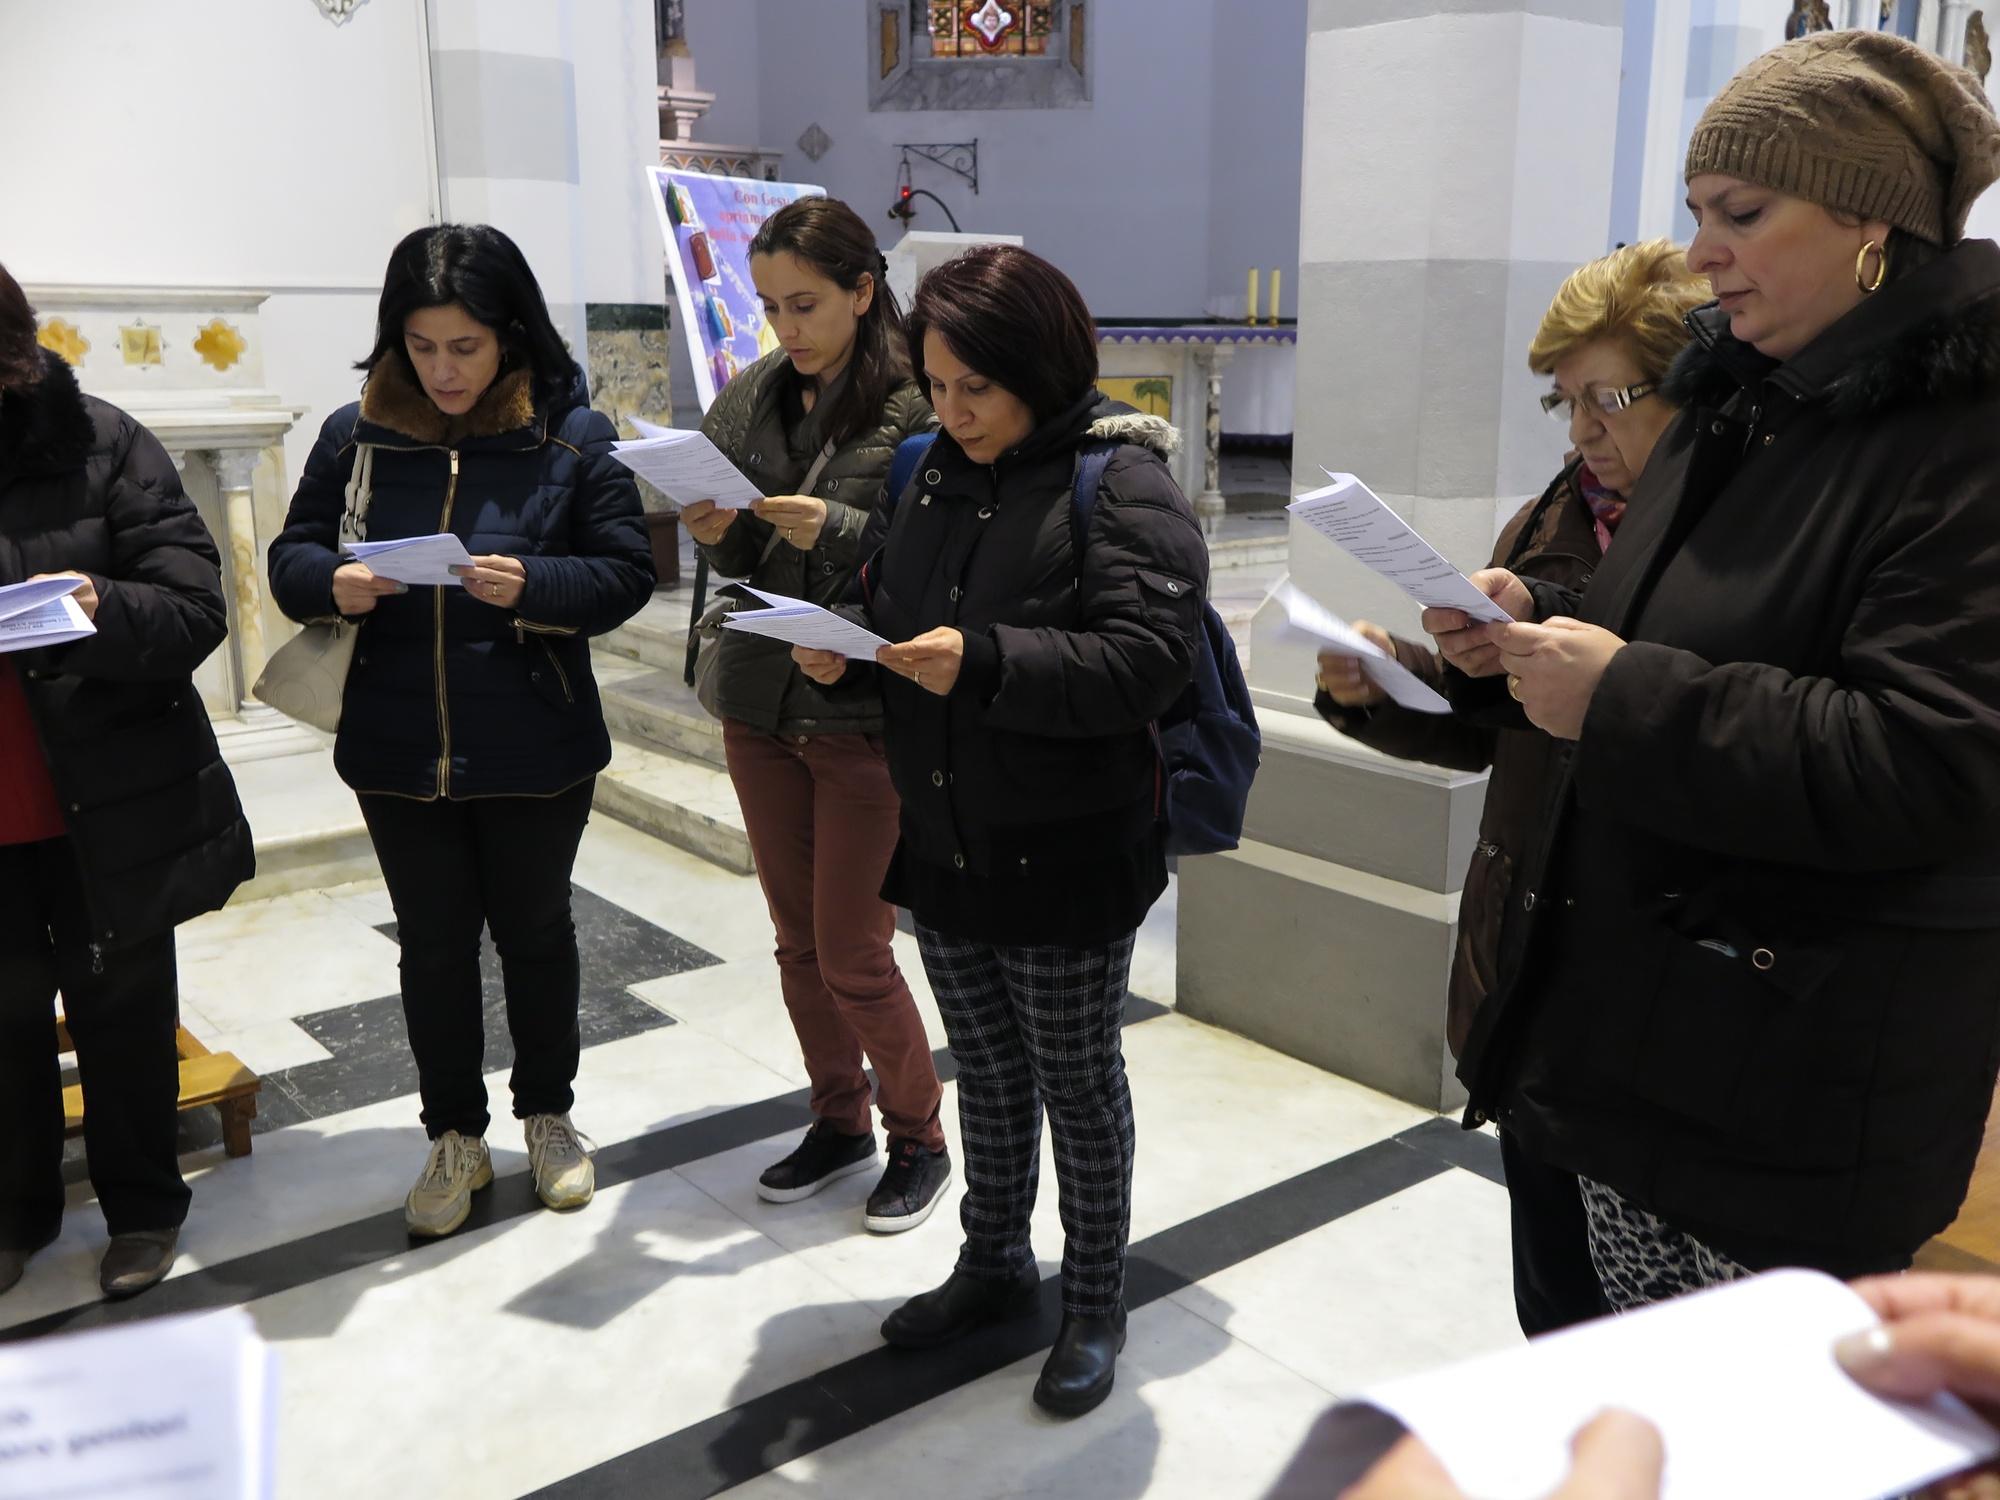 via-crucis-catechismo-2016-03-15-17-04-37